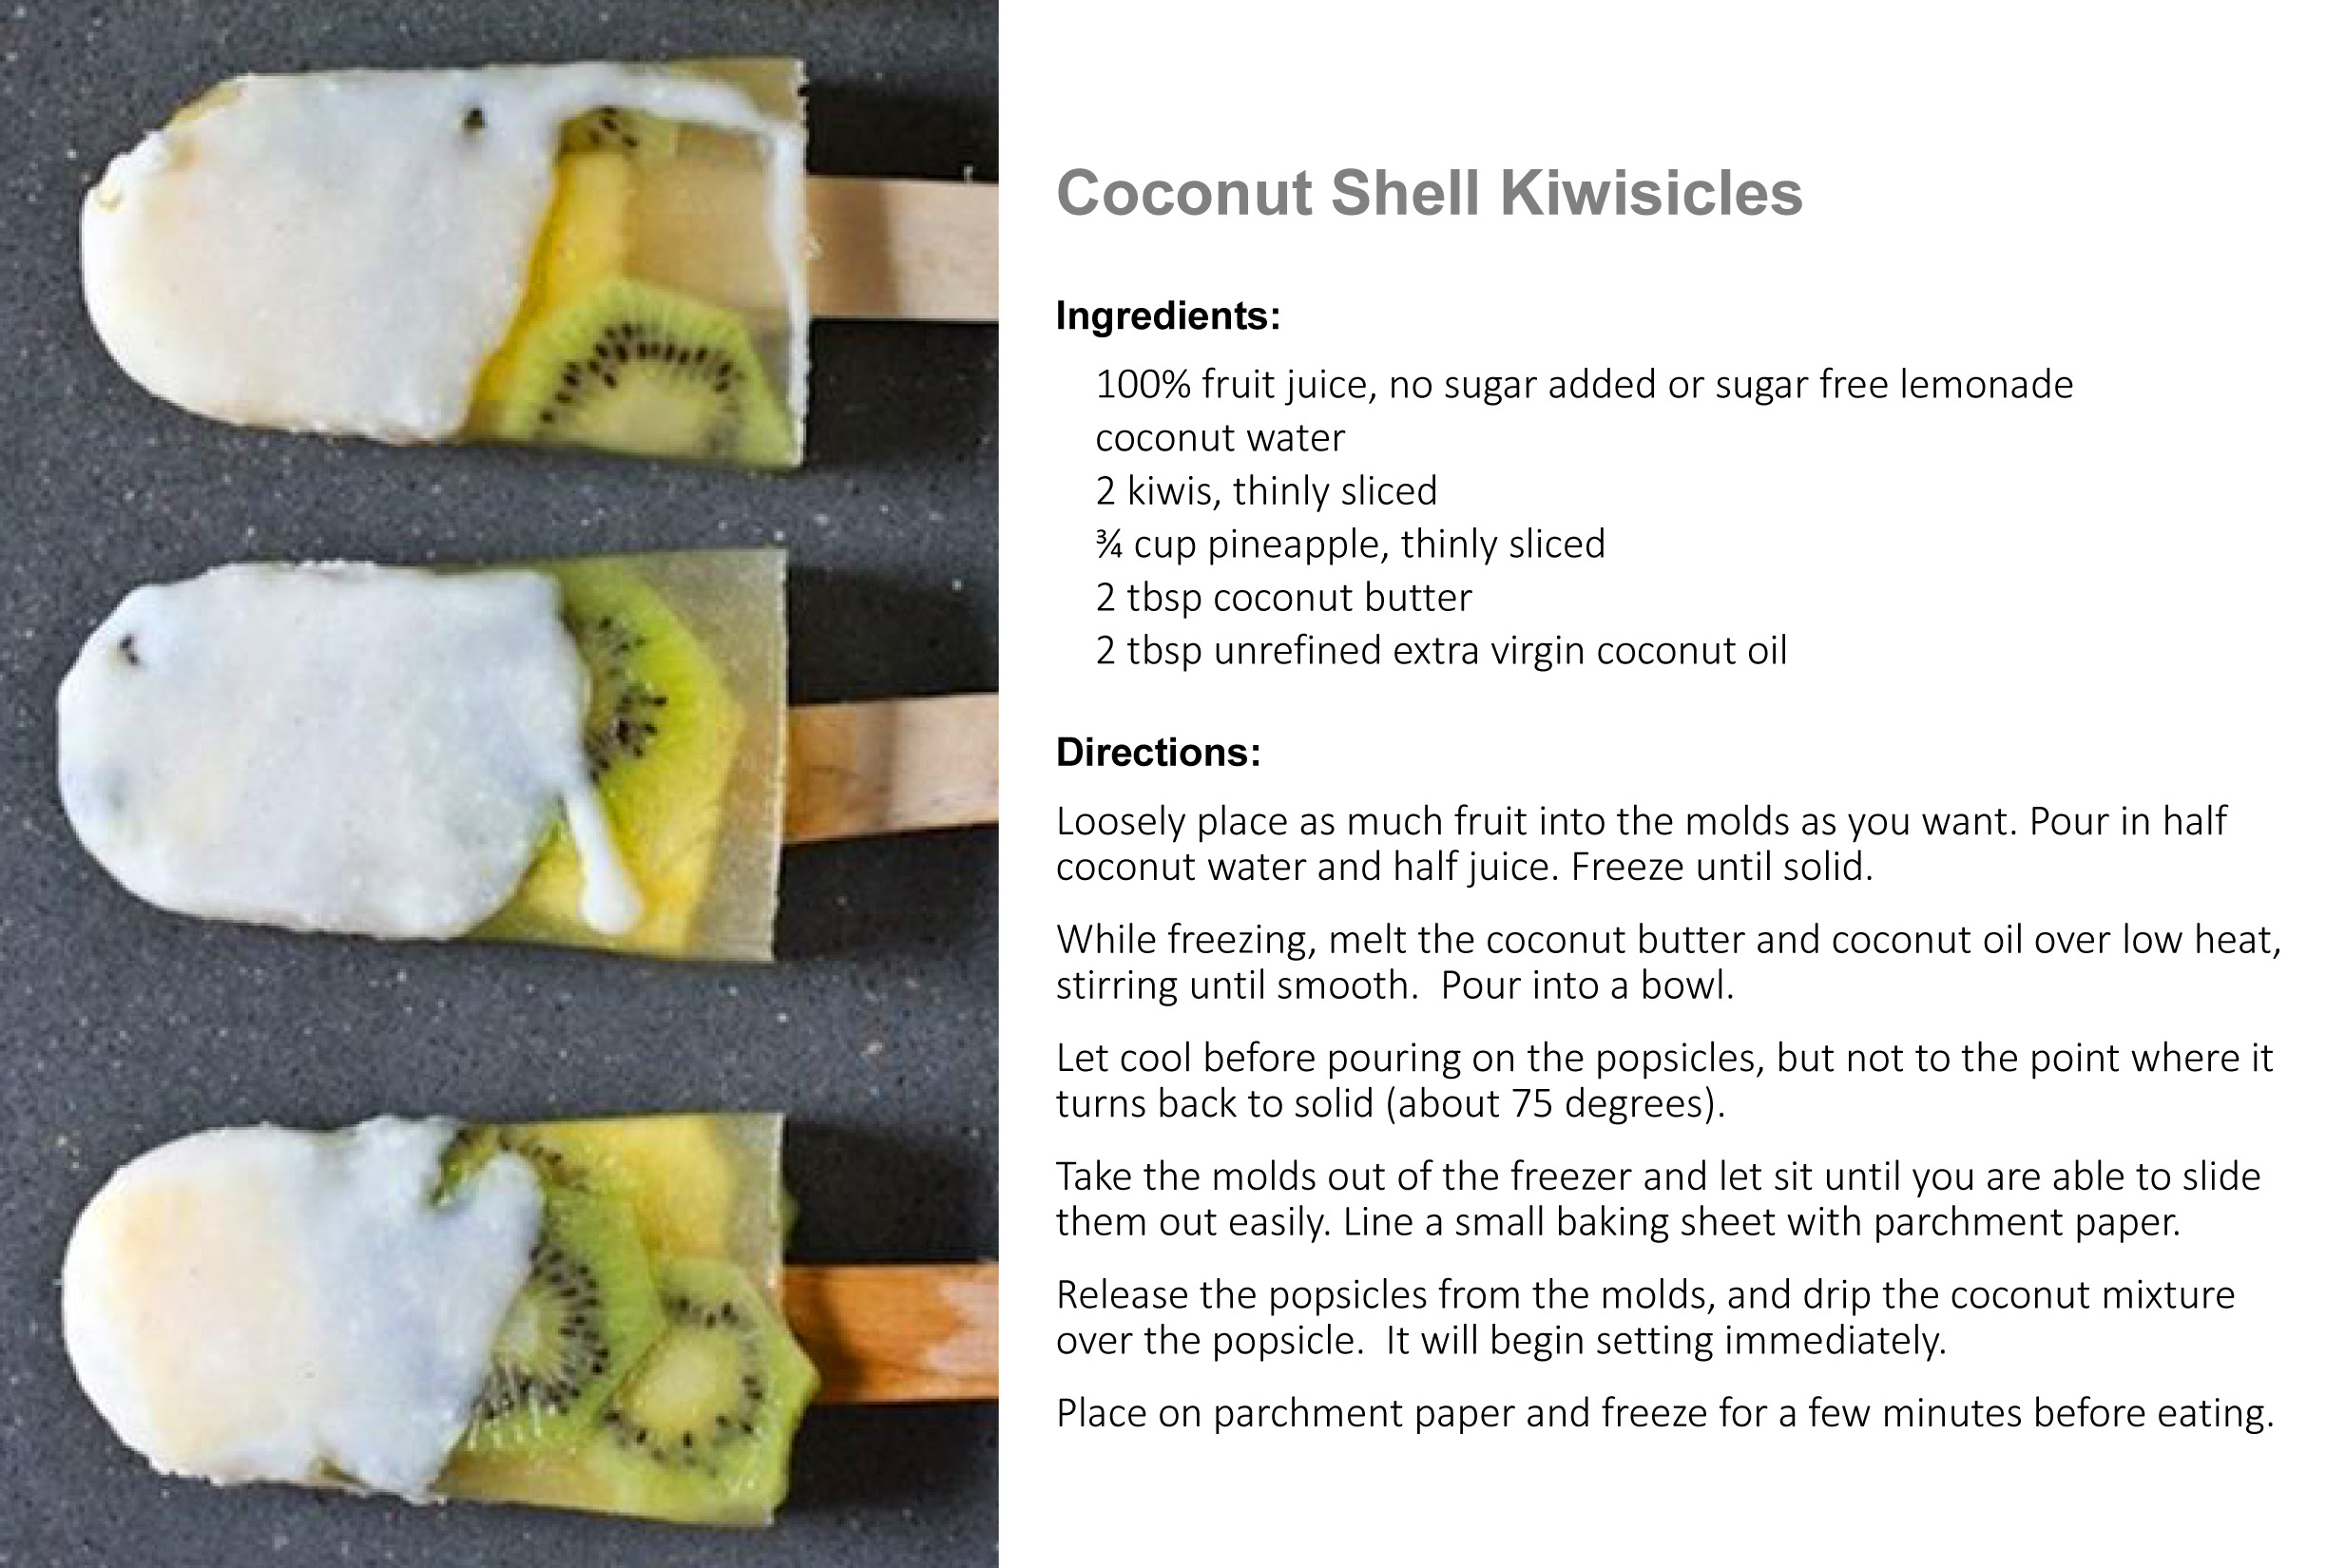 Amazing low carb coconut shell kiwisicles recipe 2447 x 1650 · 1341 kB · jpeg